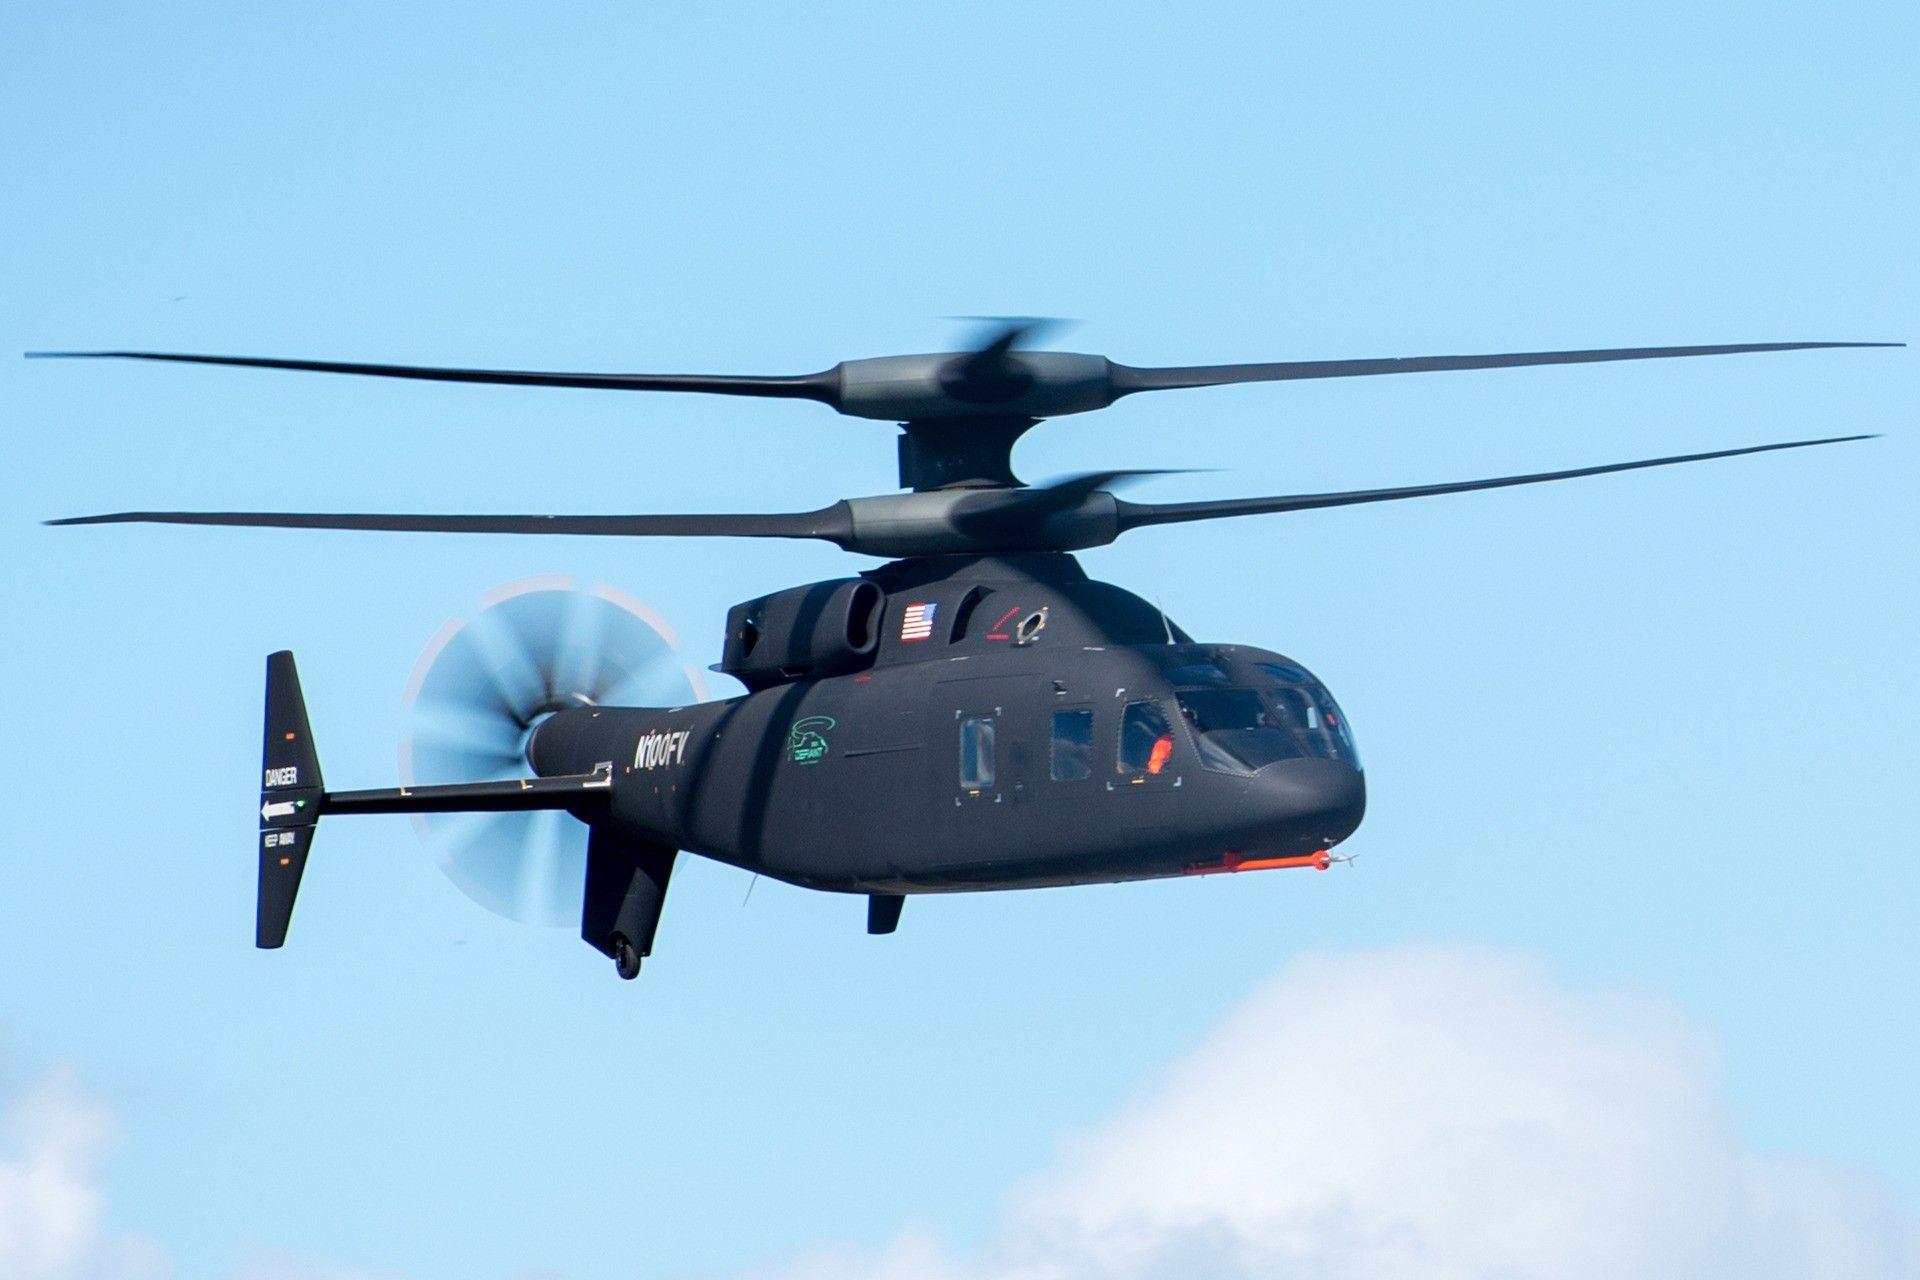 Pin von Grant Ashcraft auf Aviao in 2020 Helikopter